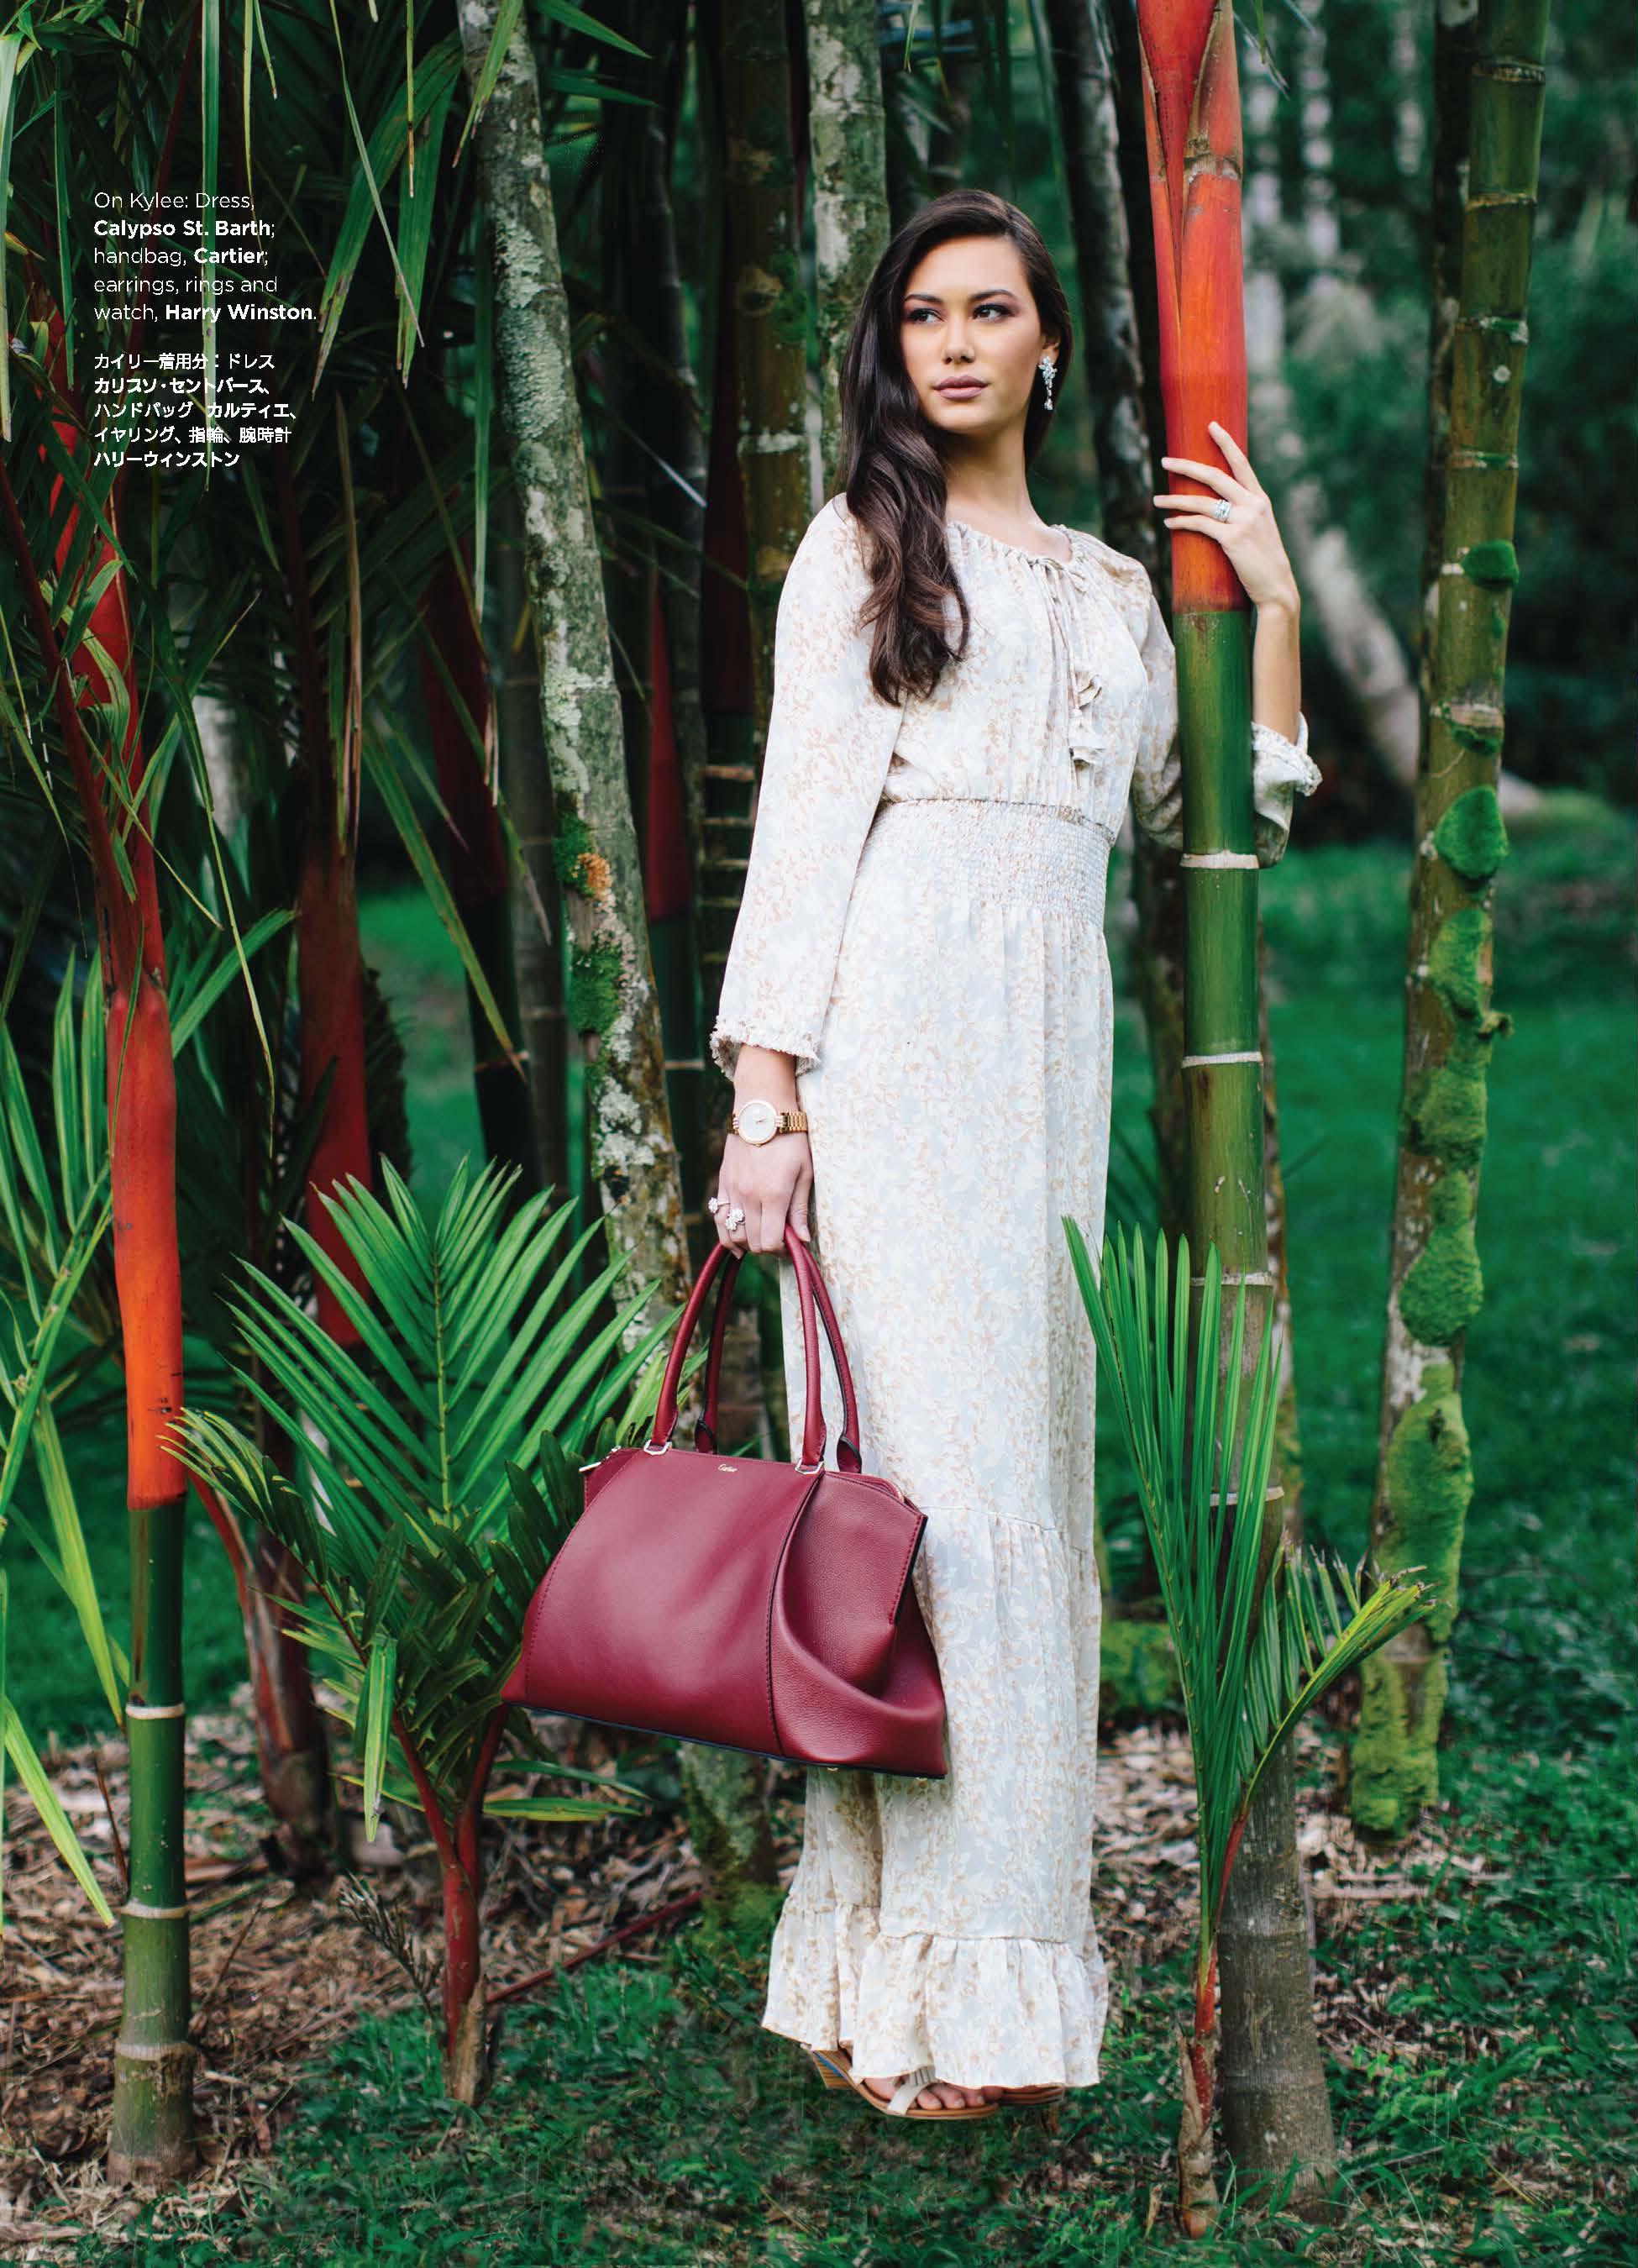 OAHRC_1511FW_Fashion_Page_41.jpg